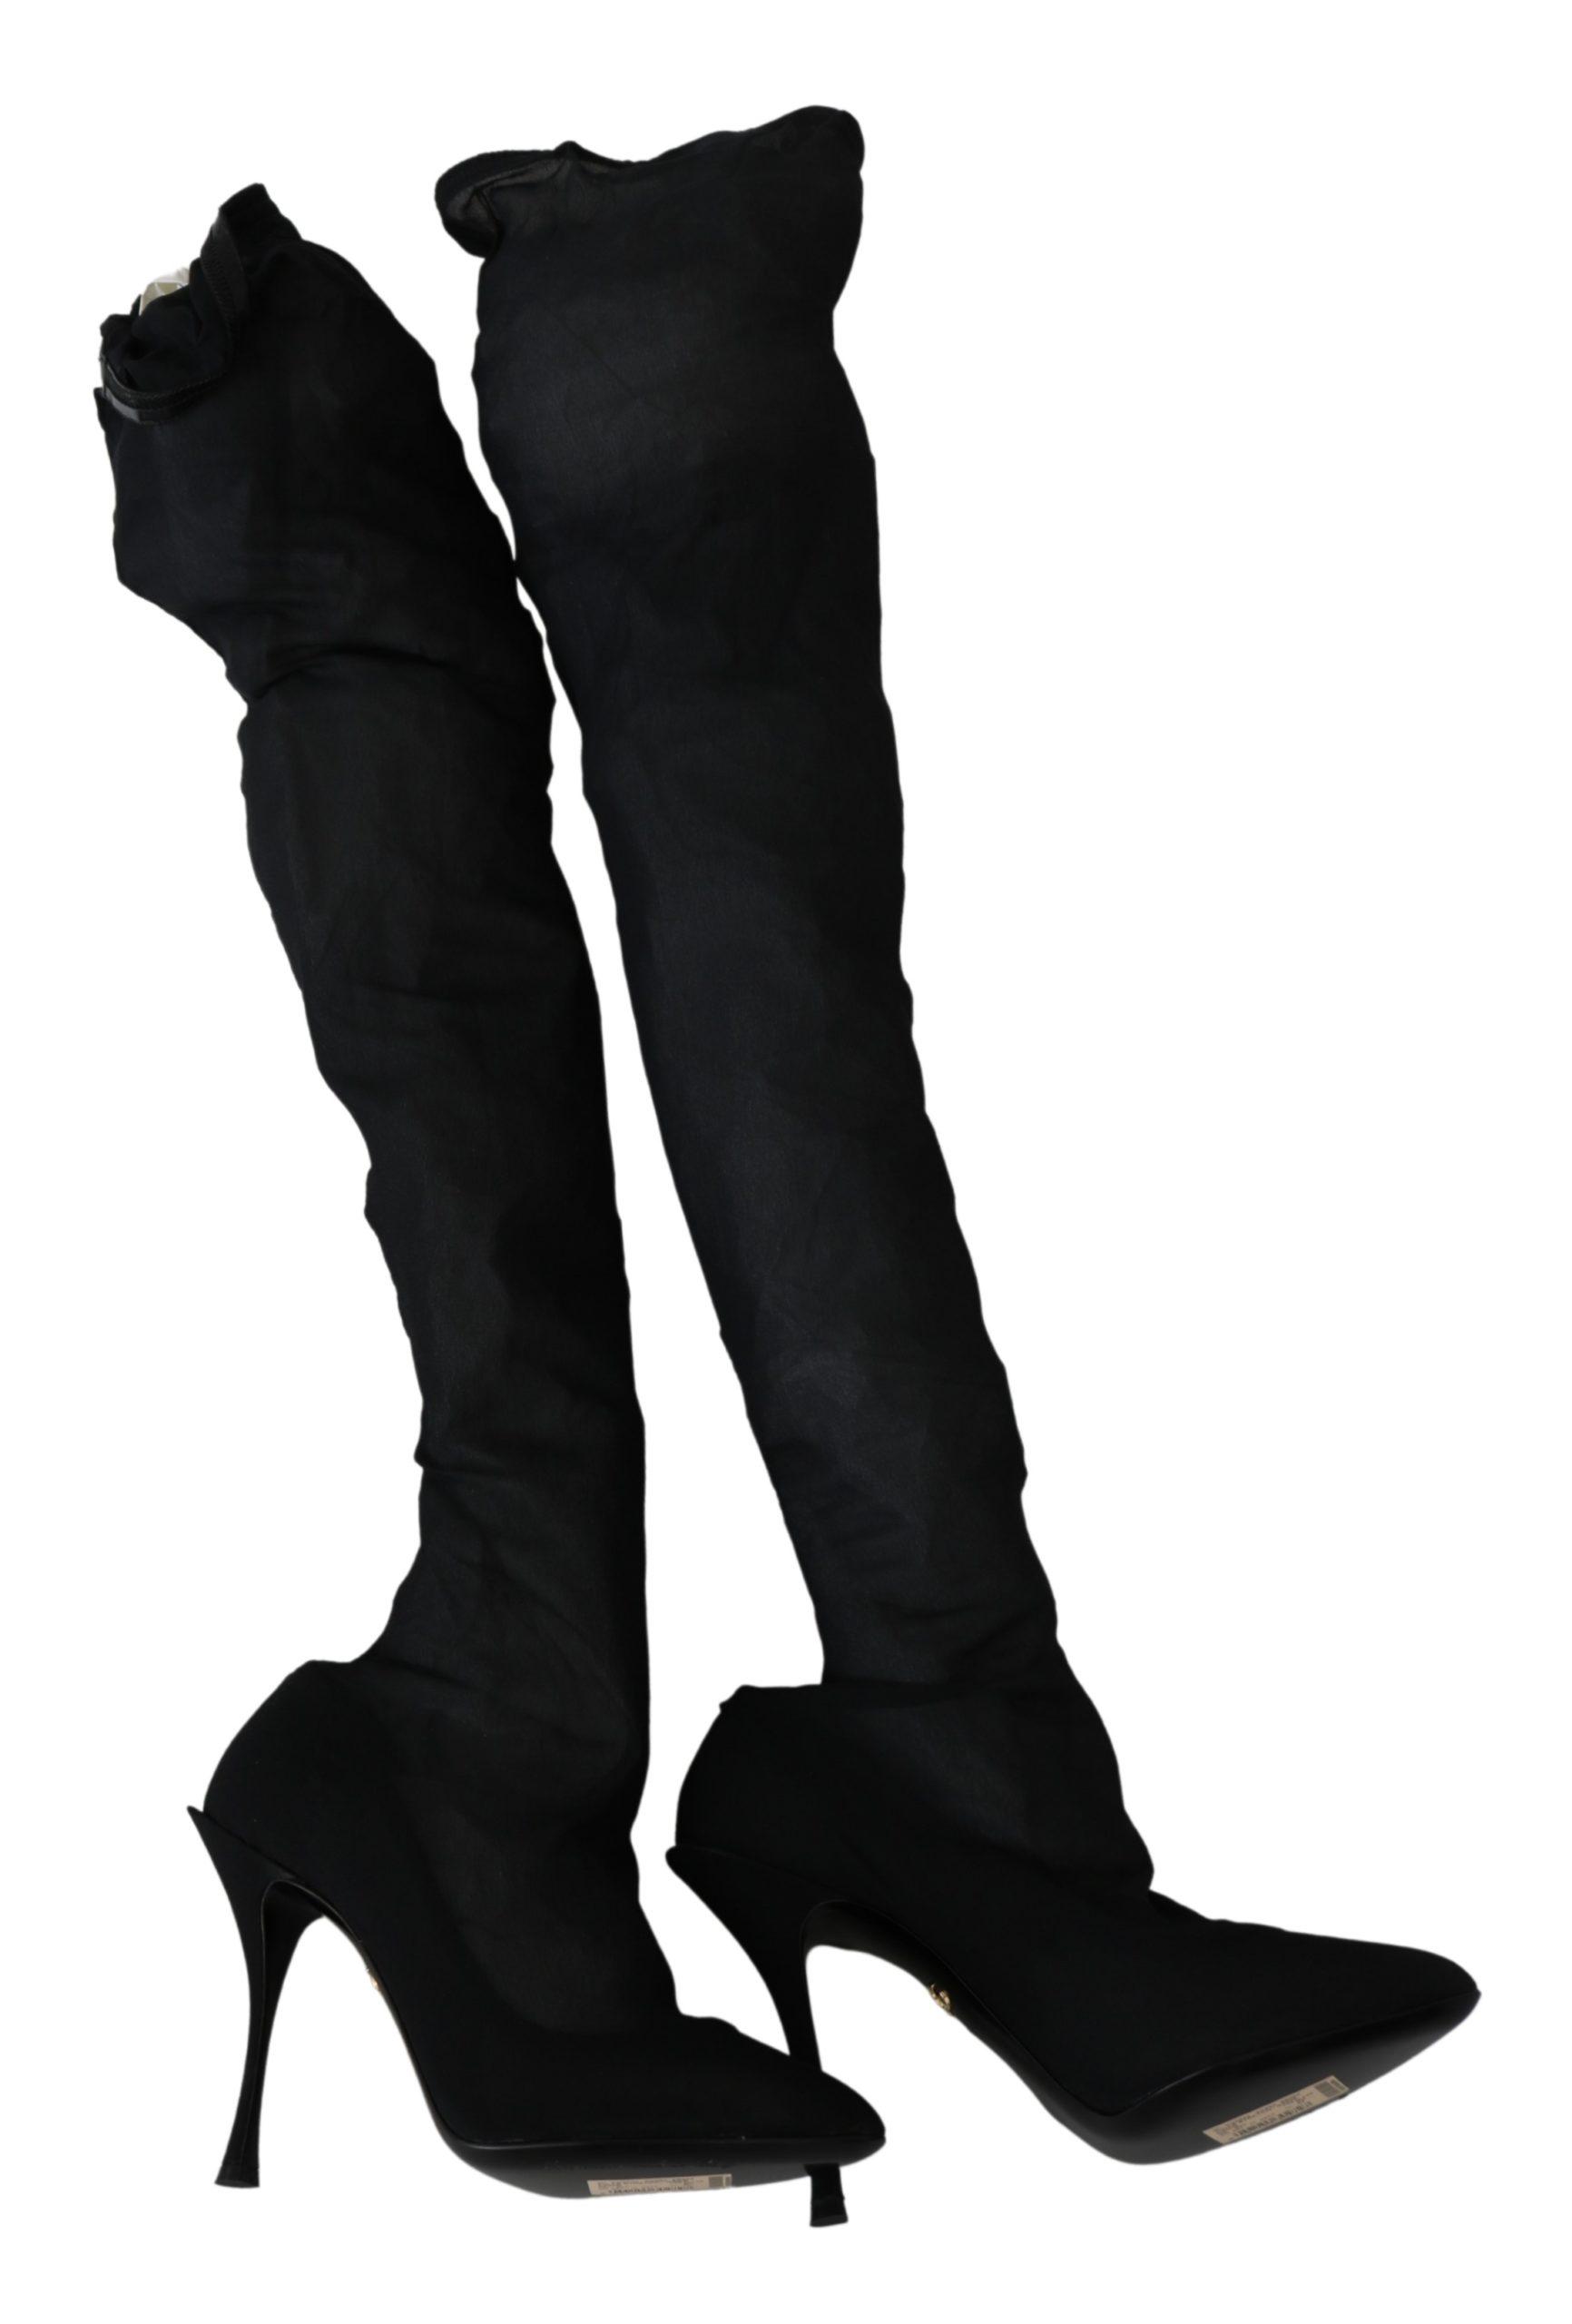 Black Tulle Stretch Knee Booties Heels Shoes - EU40/US9.5